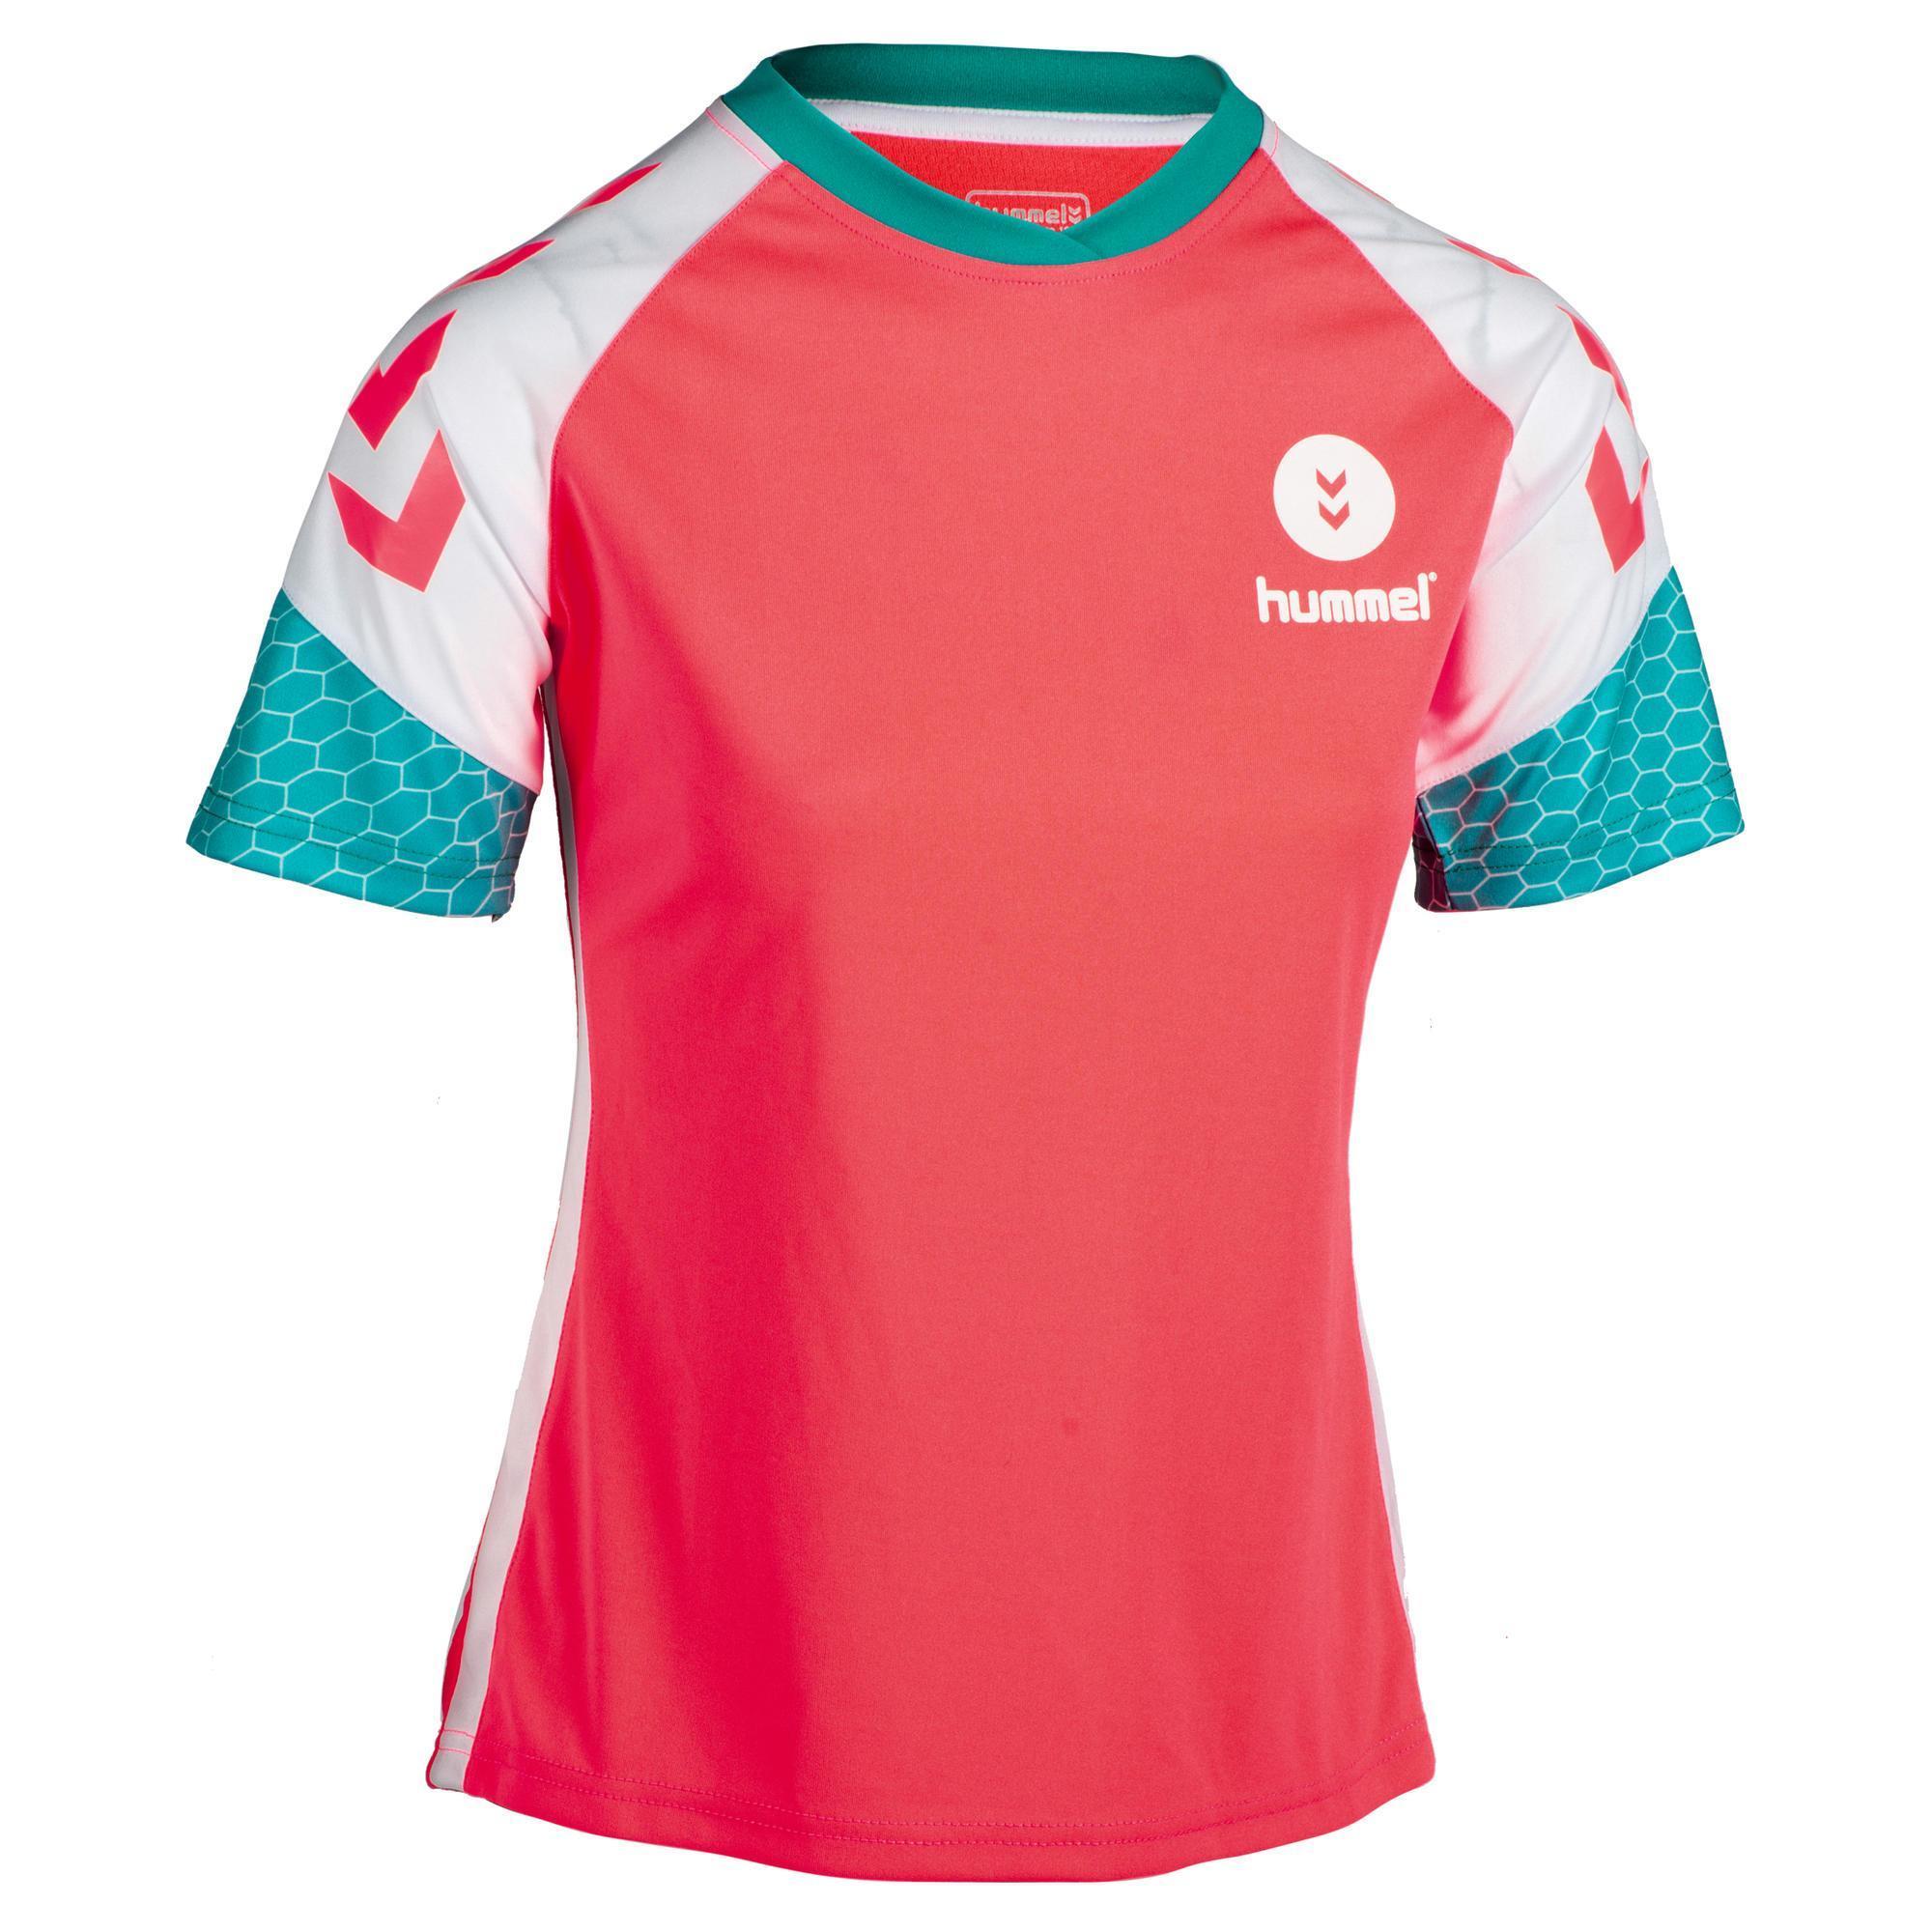 Handballtrikot Damen rosa/weiß/blau/türkis | Sportbekleidung > Trikots > Handballtrikots | Hummel